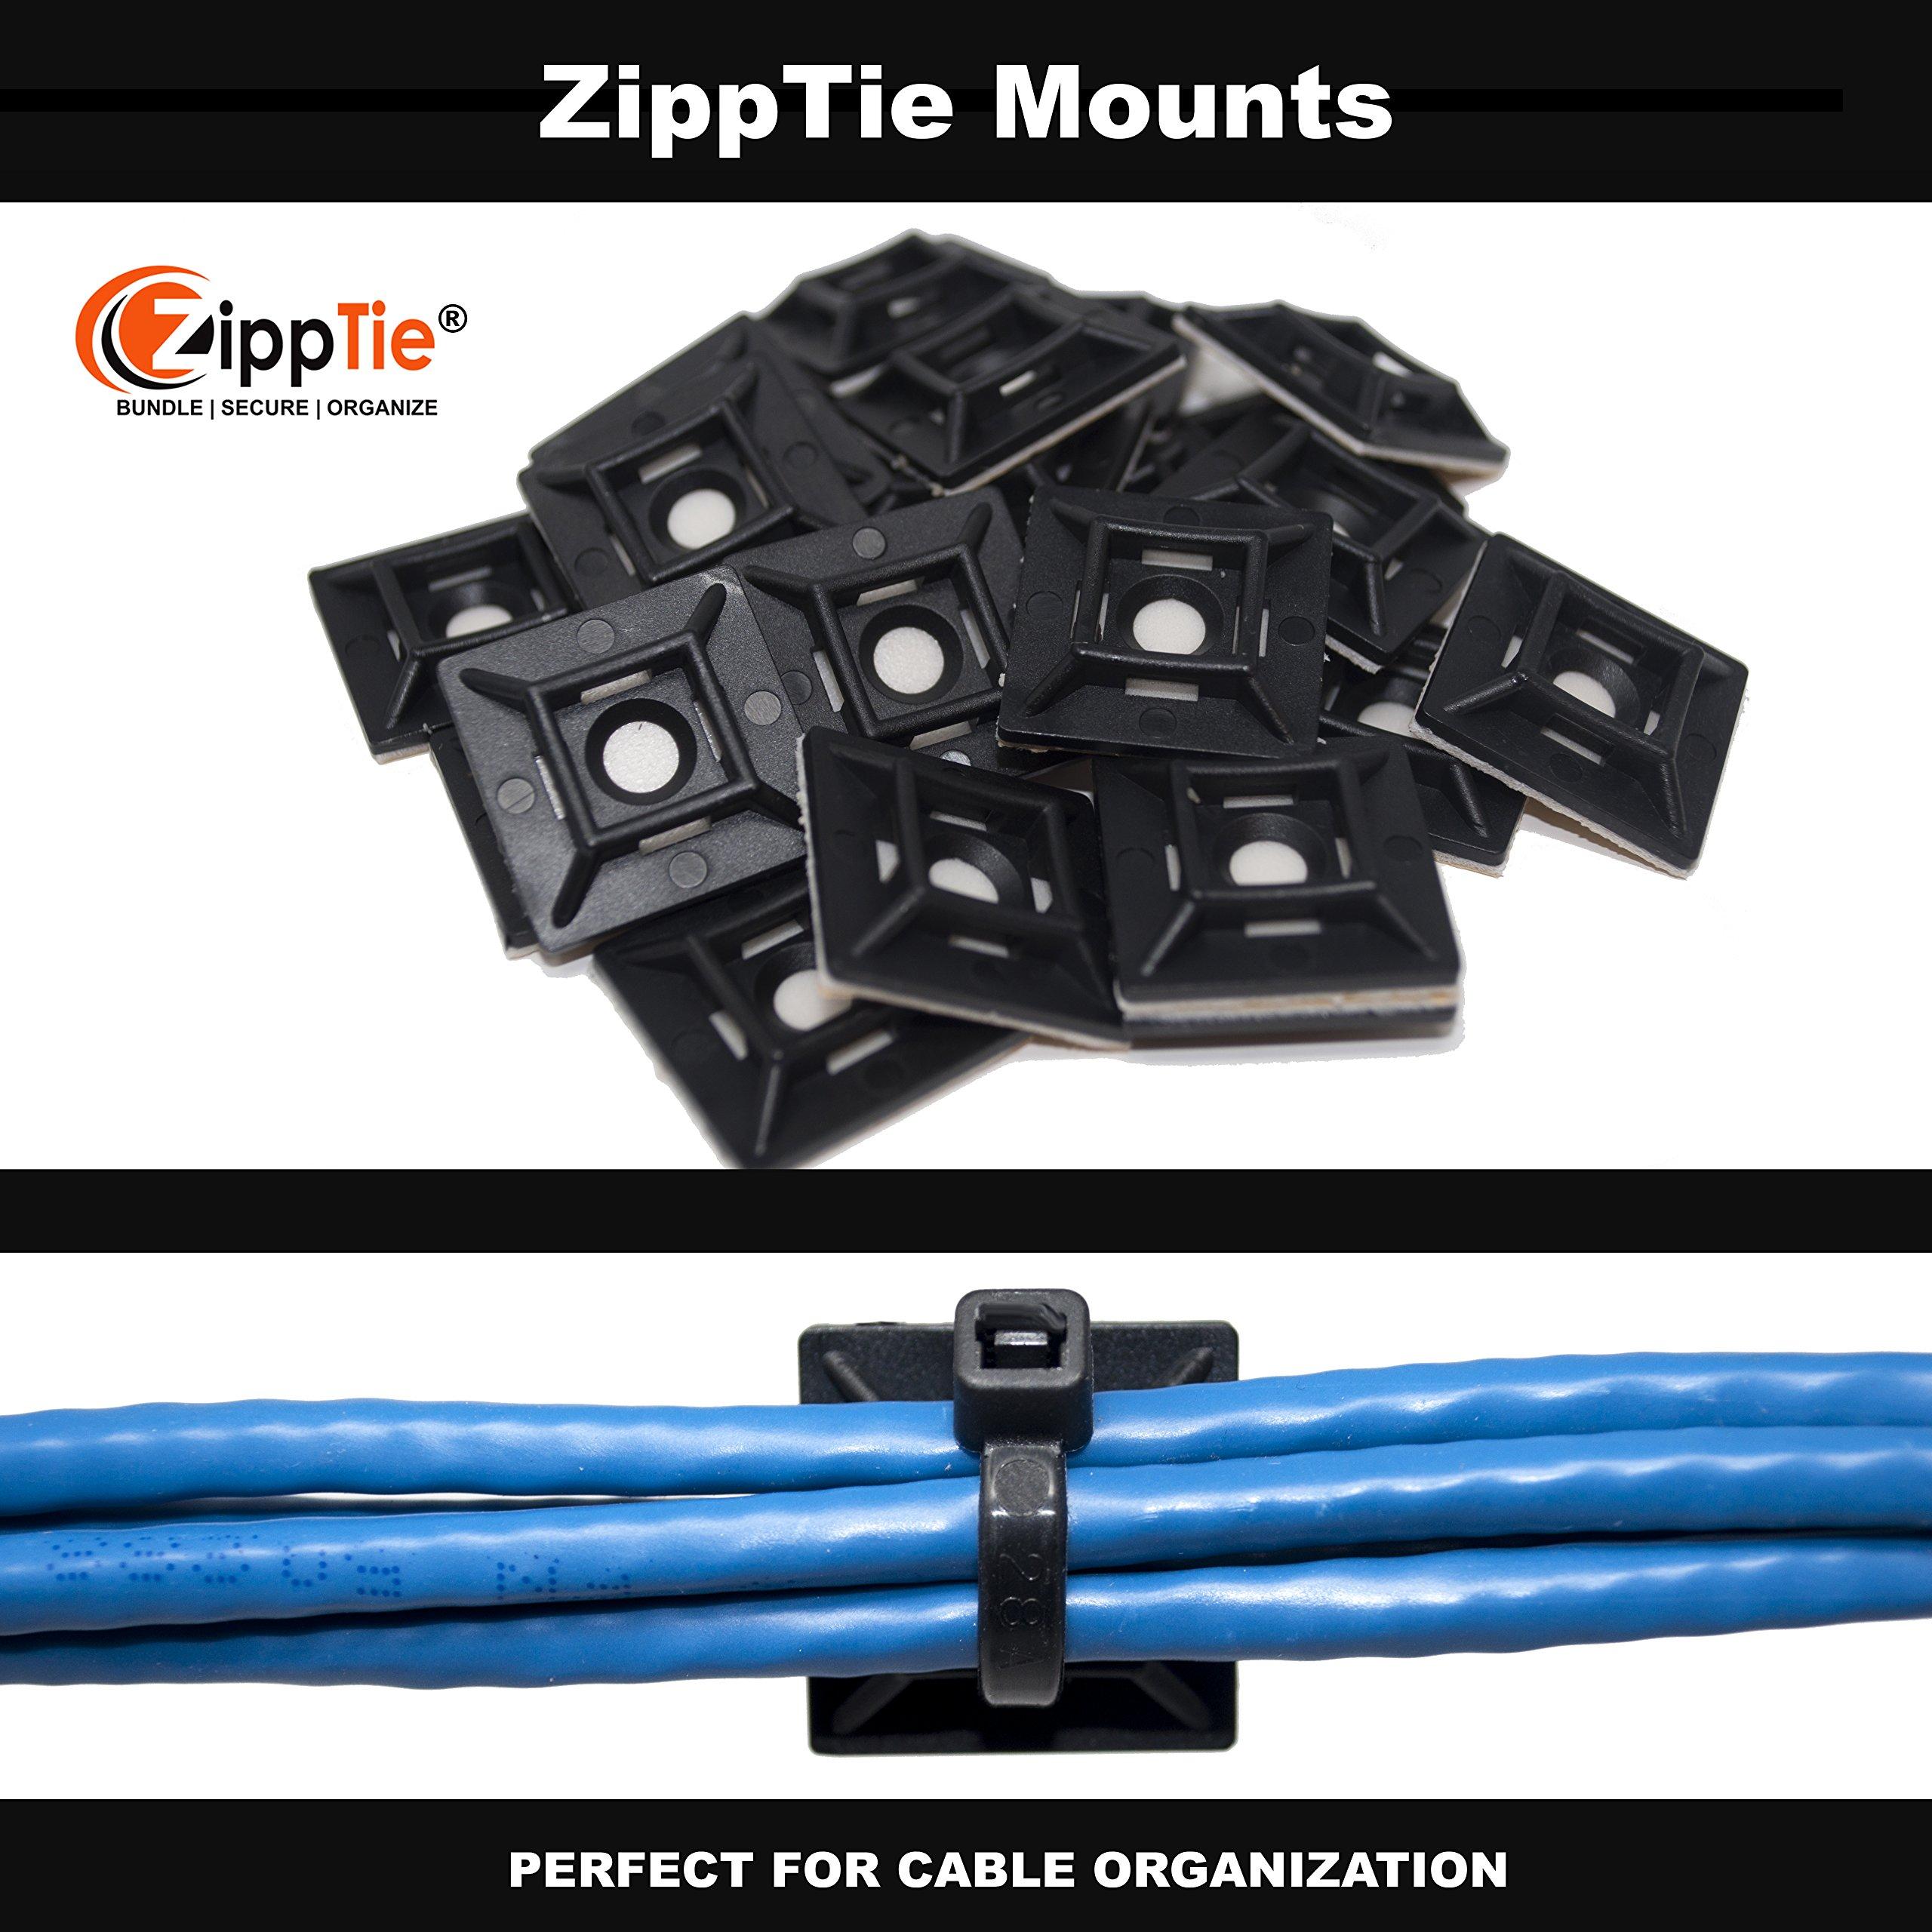 Cable Ties by ZippTie | 225pc Cable Management Kit 6'', 8'', 12'' White & UV Black Heavy Duty (Zip Ties) 50lb & 75lb | Includes 20 Adhesive Base Mounts and 5 Reusable ZippCro Wraps by ZippTie Bundle | Secure | Organize (Image #7)